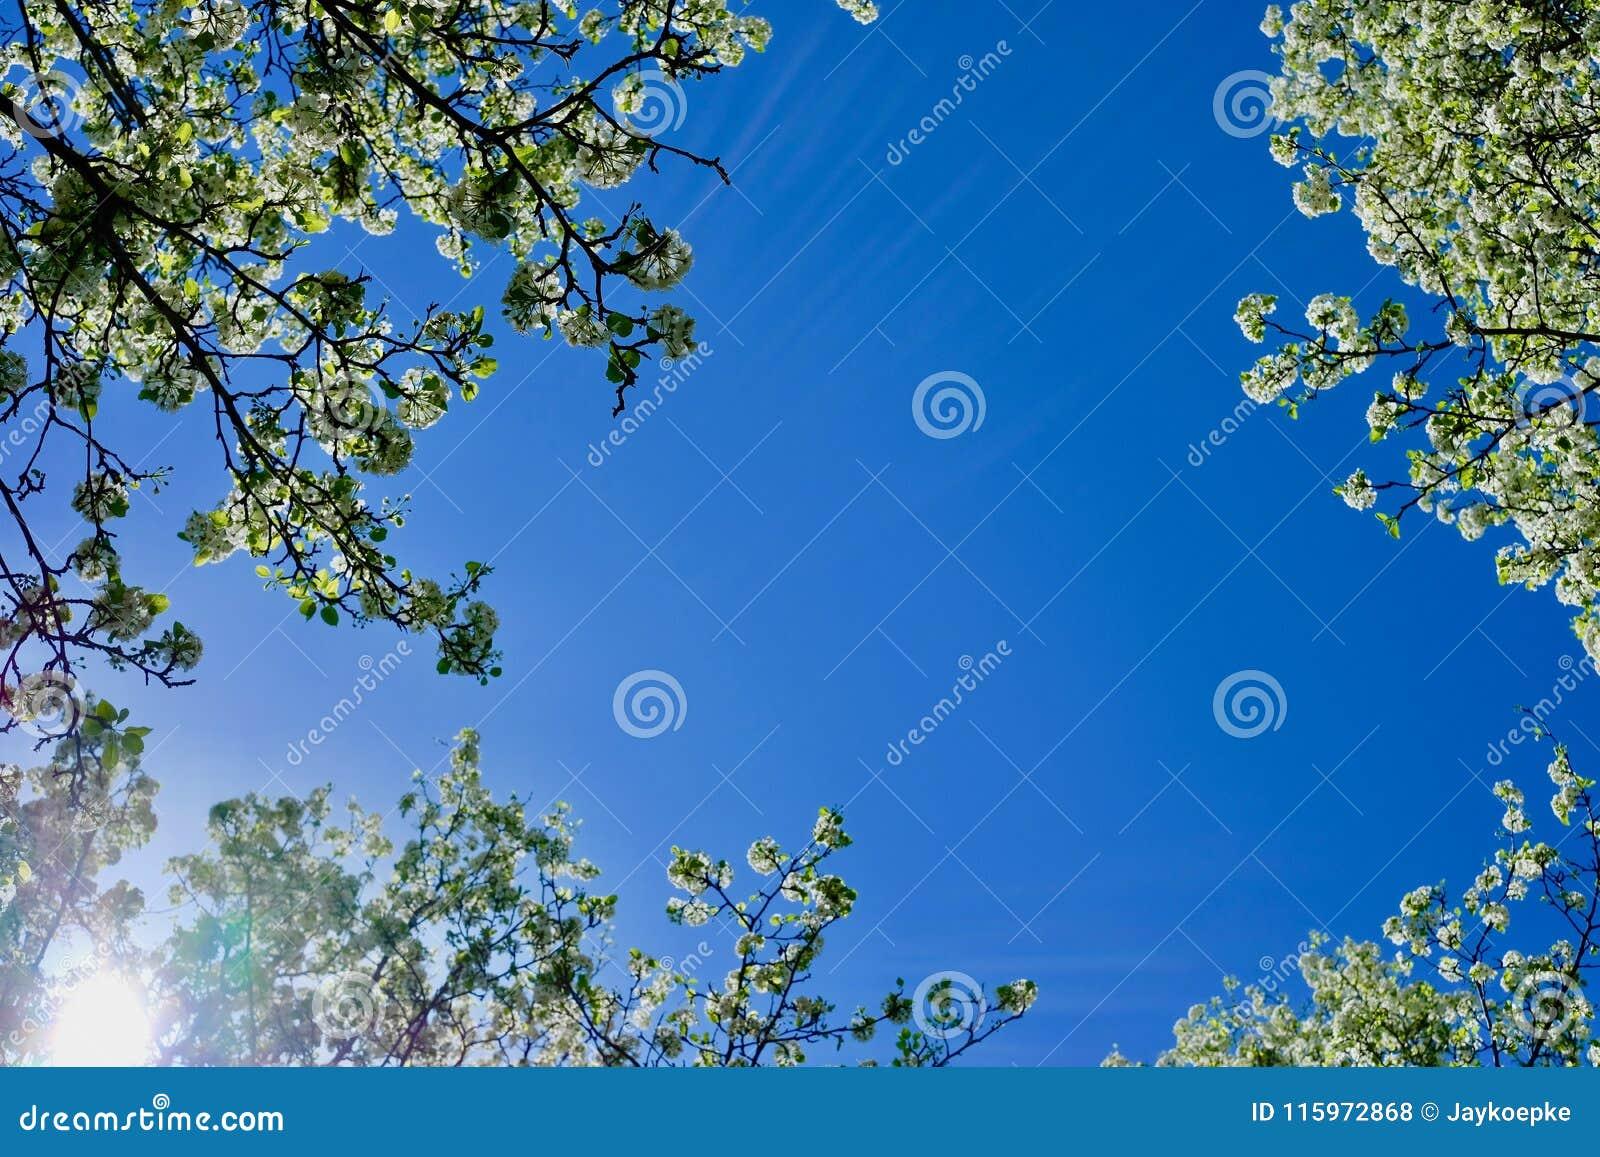 Flowering trees from below with blue sky behind stock photo image flowering trees from below with blue sky behind izmirmasajfo